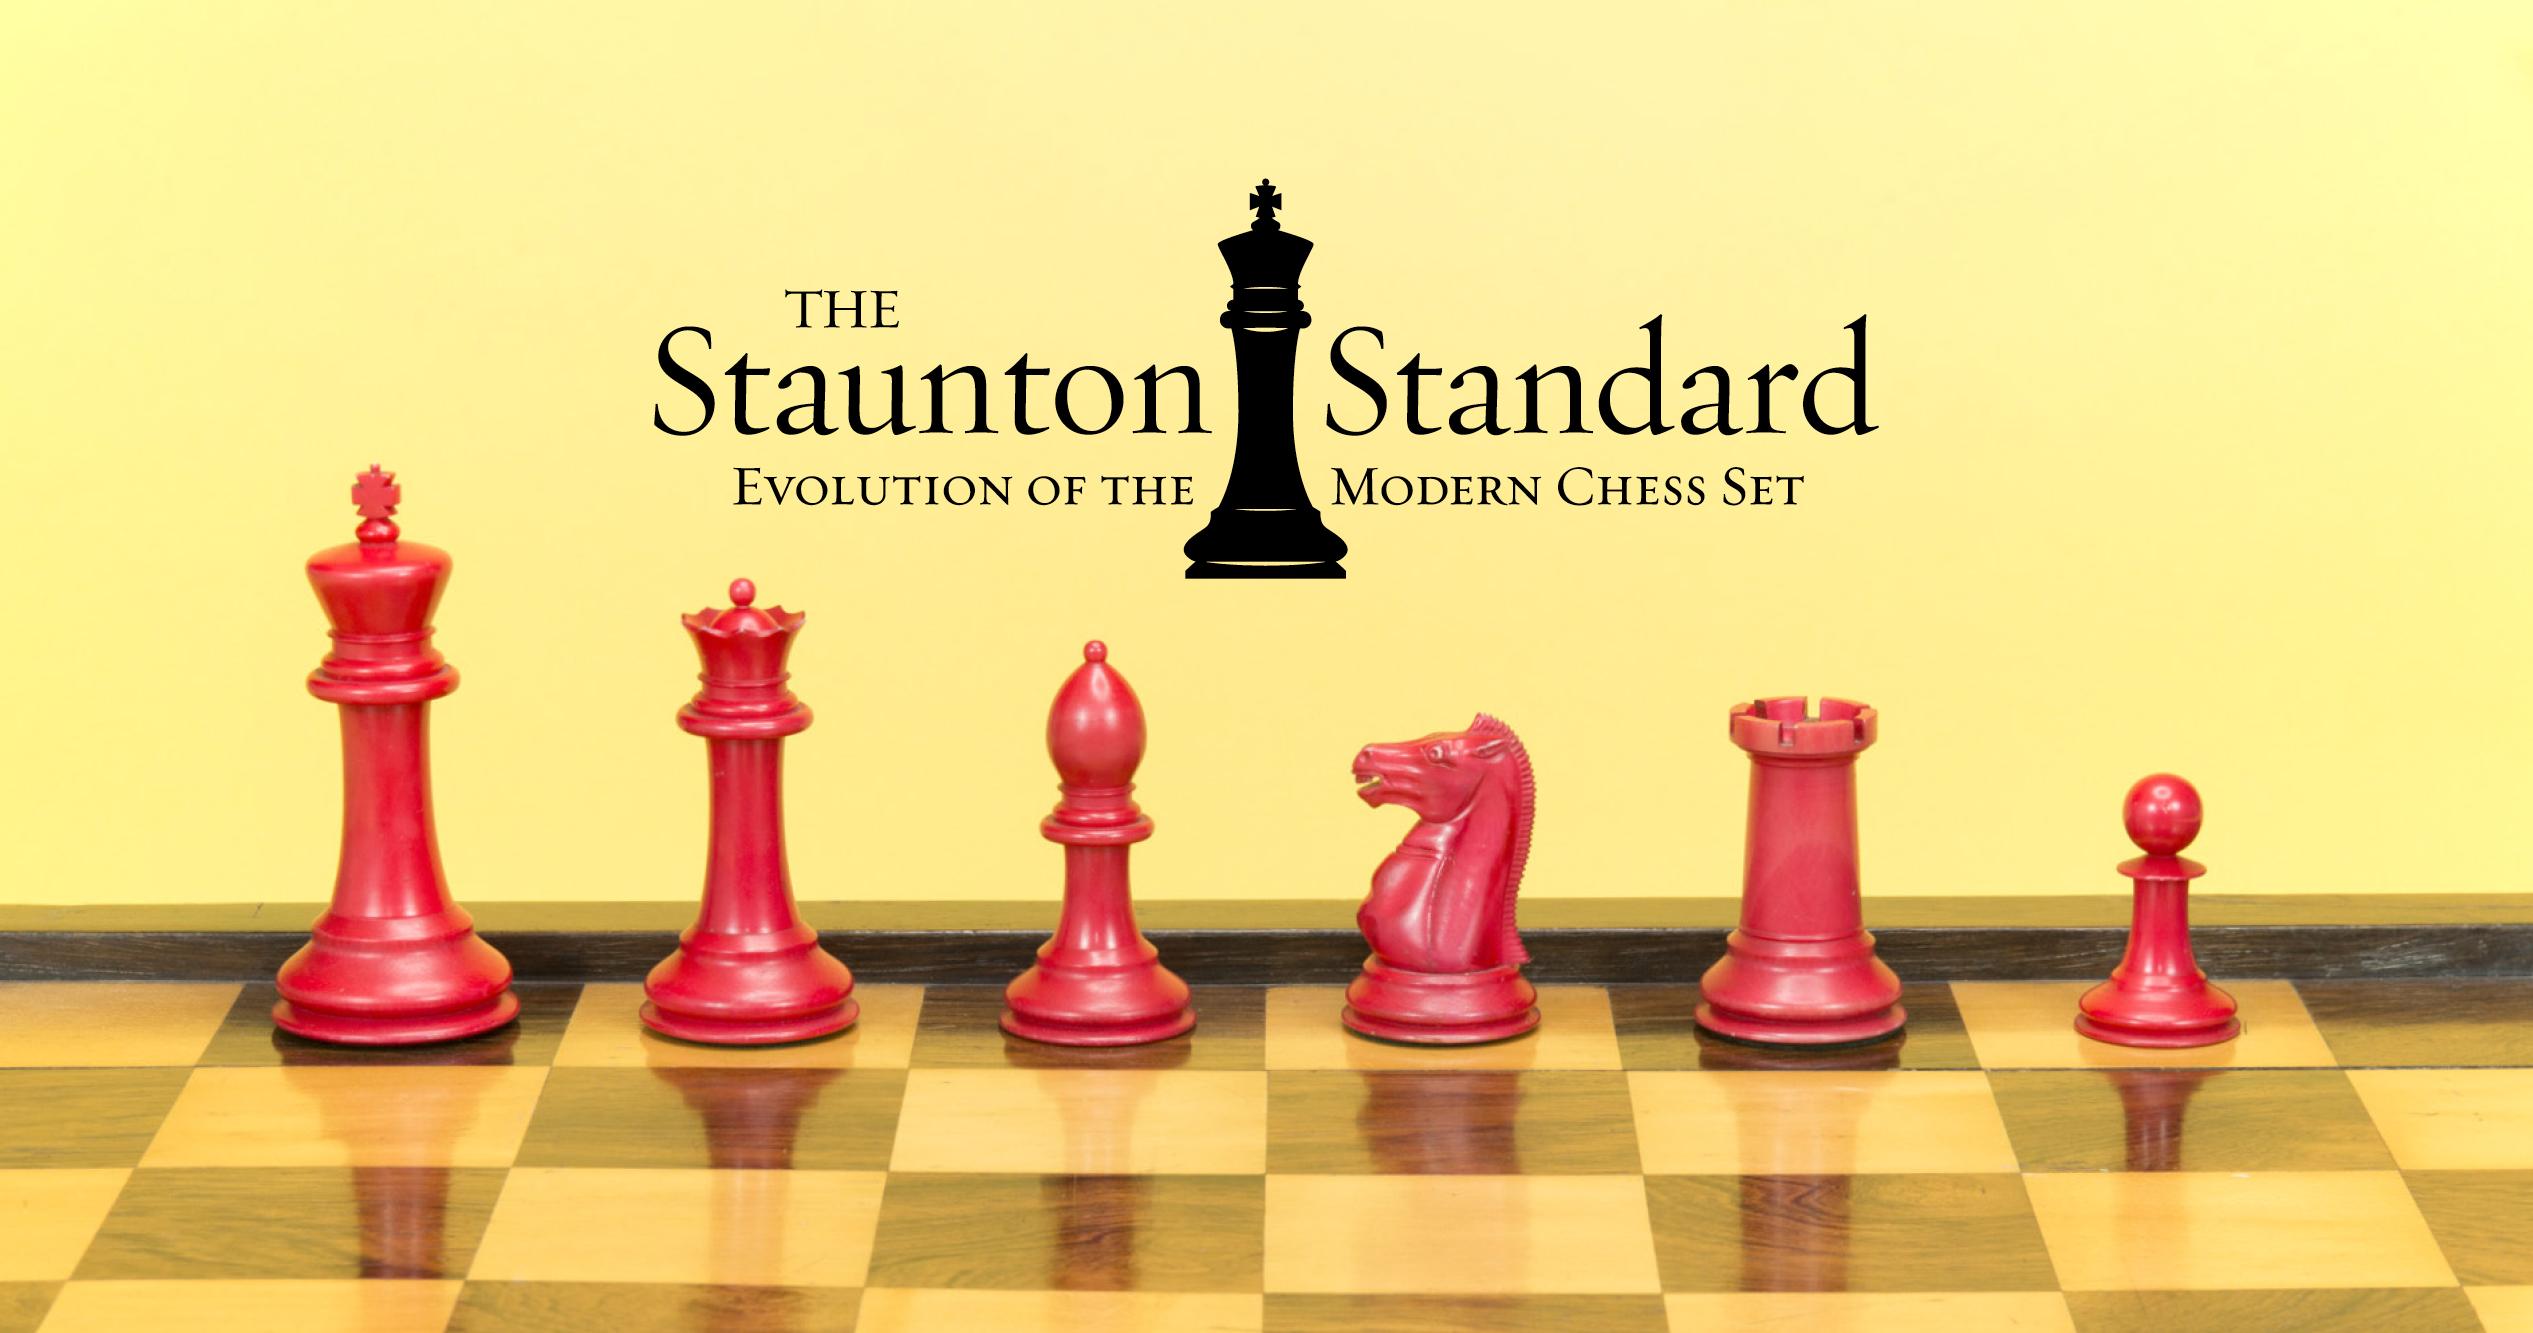 World Chess Hall of Fame |